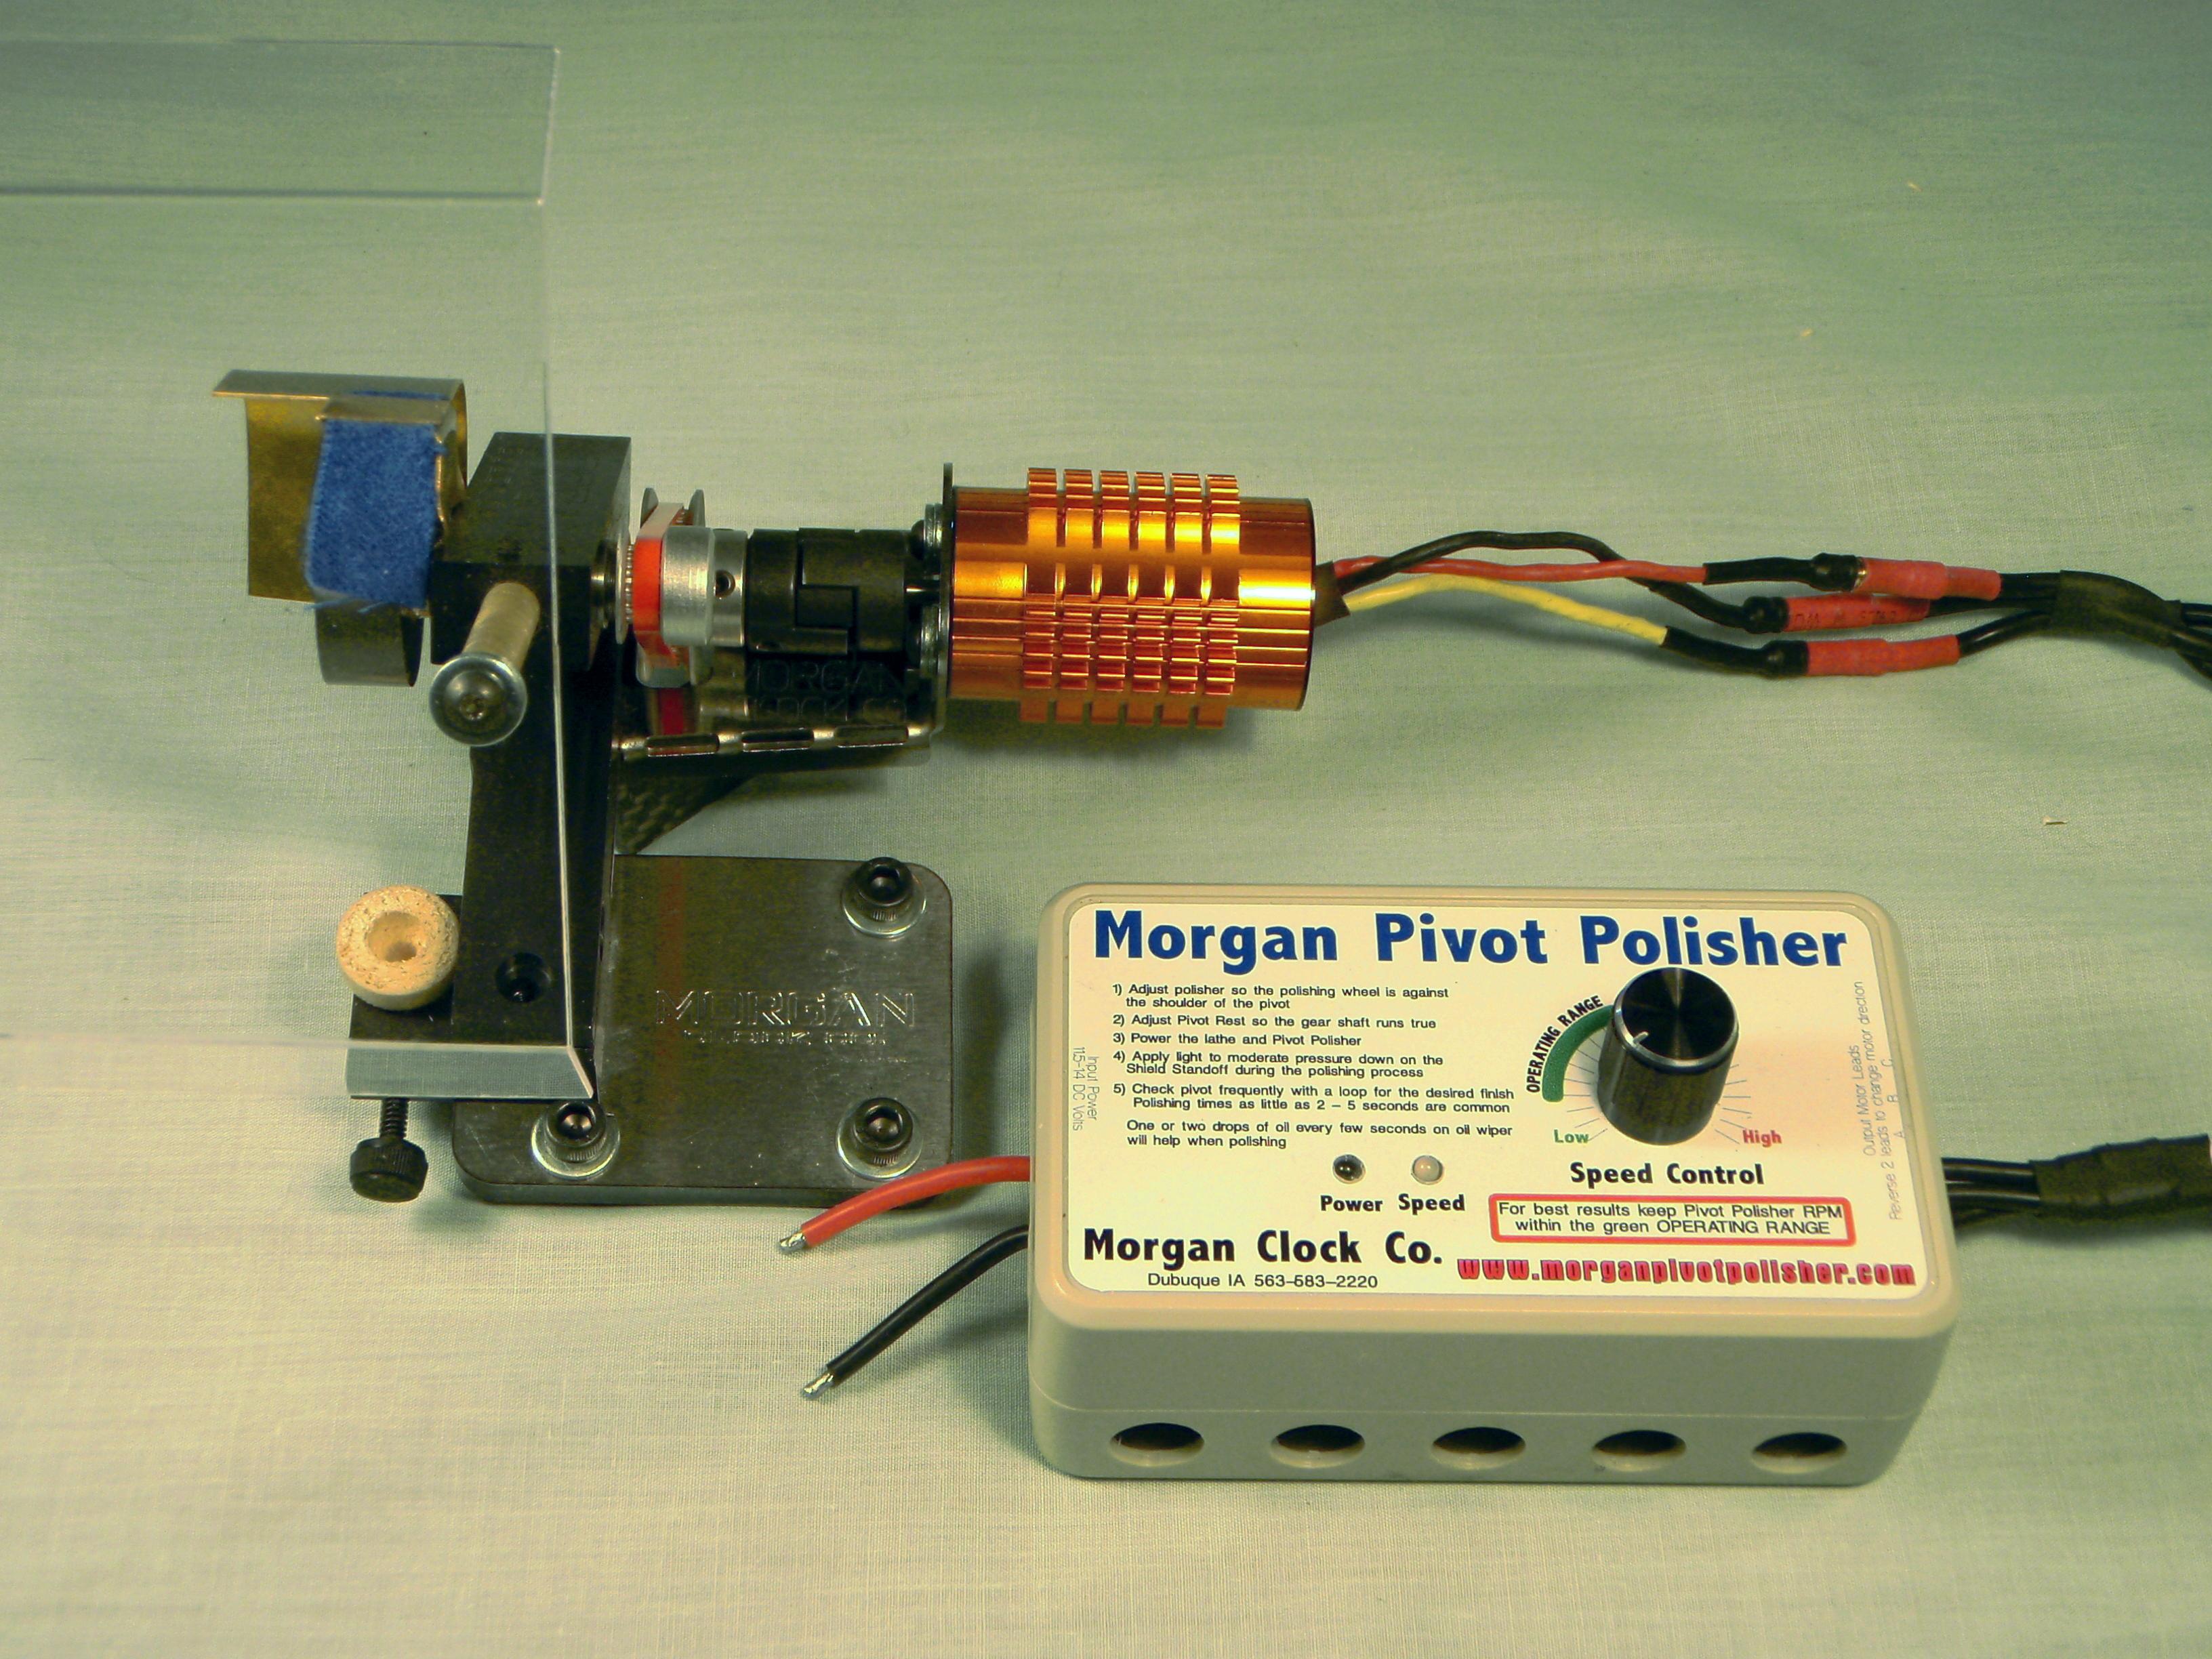 Morgan Pivot Polisher for watchmaker lathe or Sherline lathe